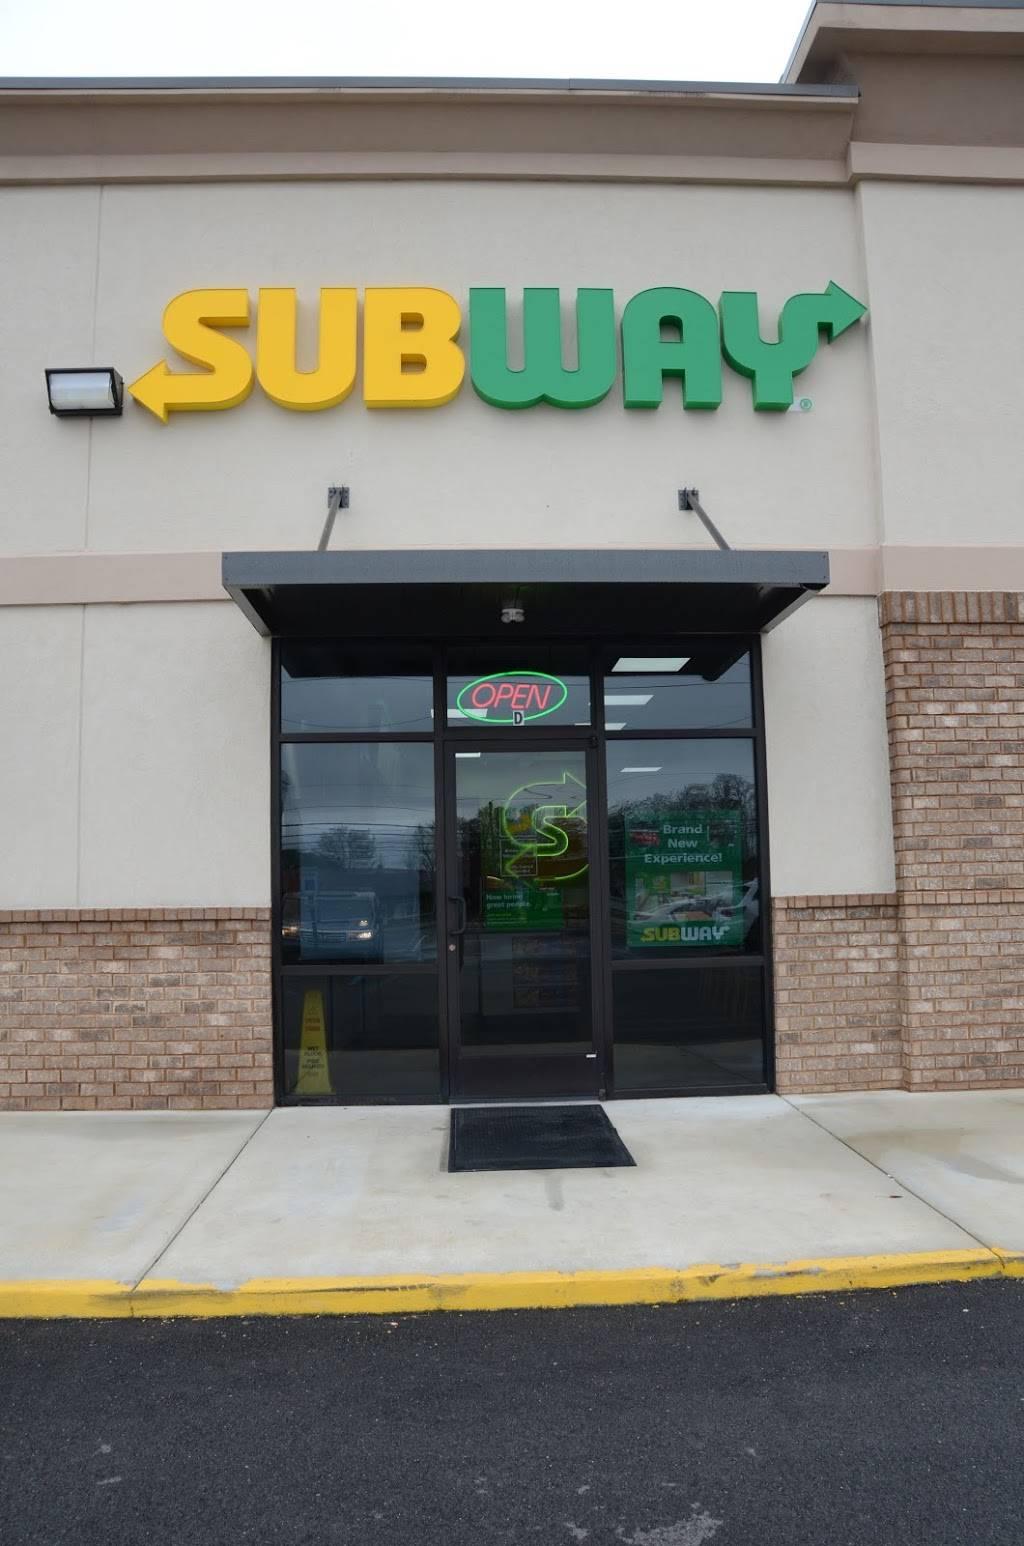 Subway   restaurant   11805 US 231/431, unit d, Meridianville, AL 35759, USA   2568282611 OR +1 256-828-2611